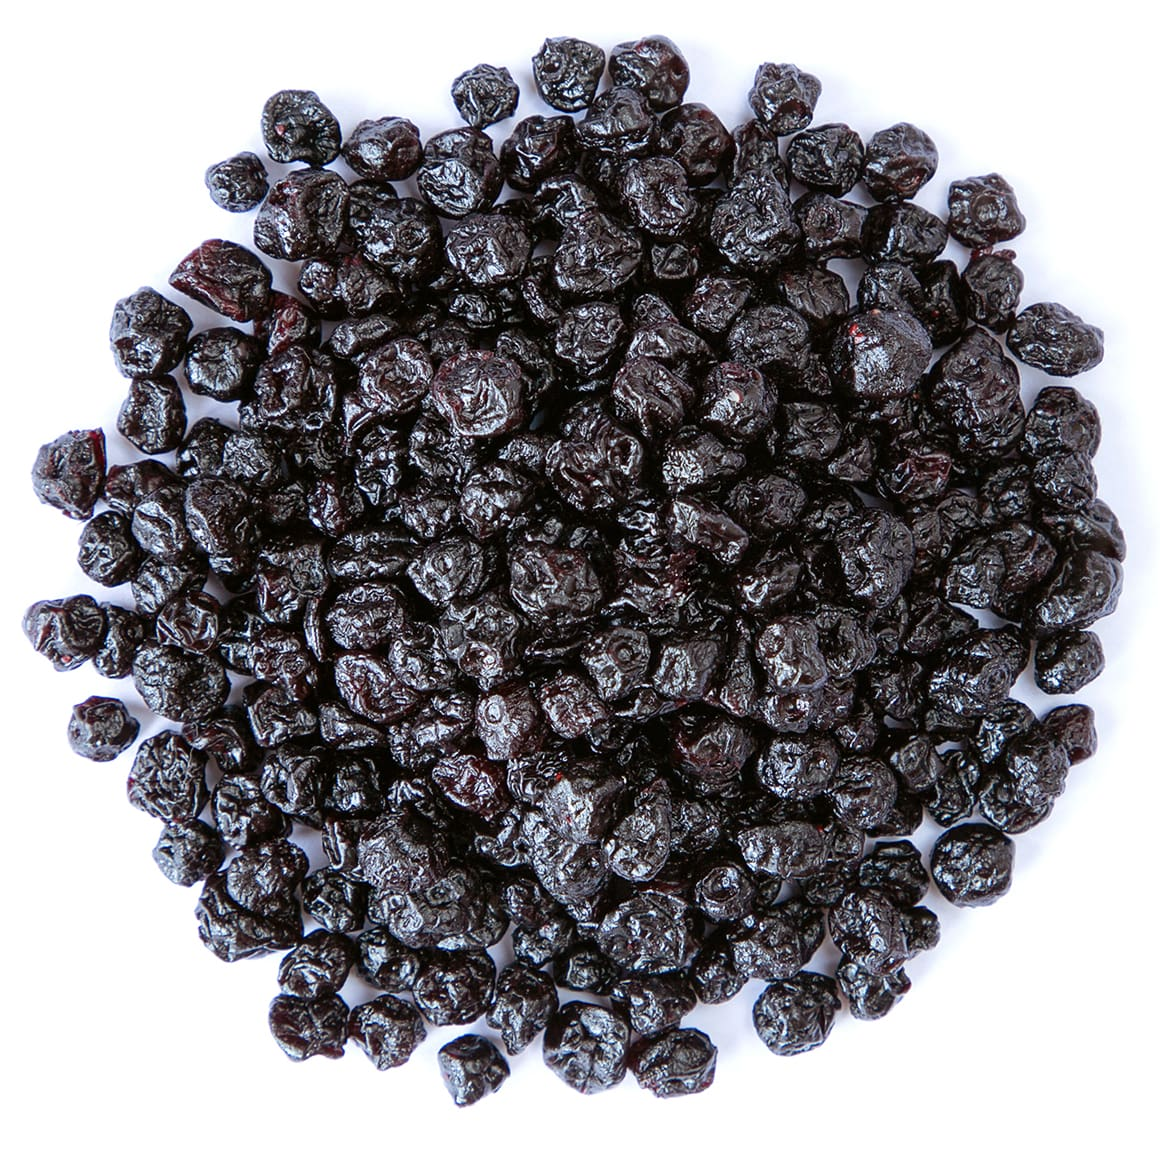 organic-dried-blueberries-main ftl